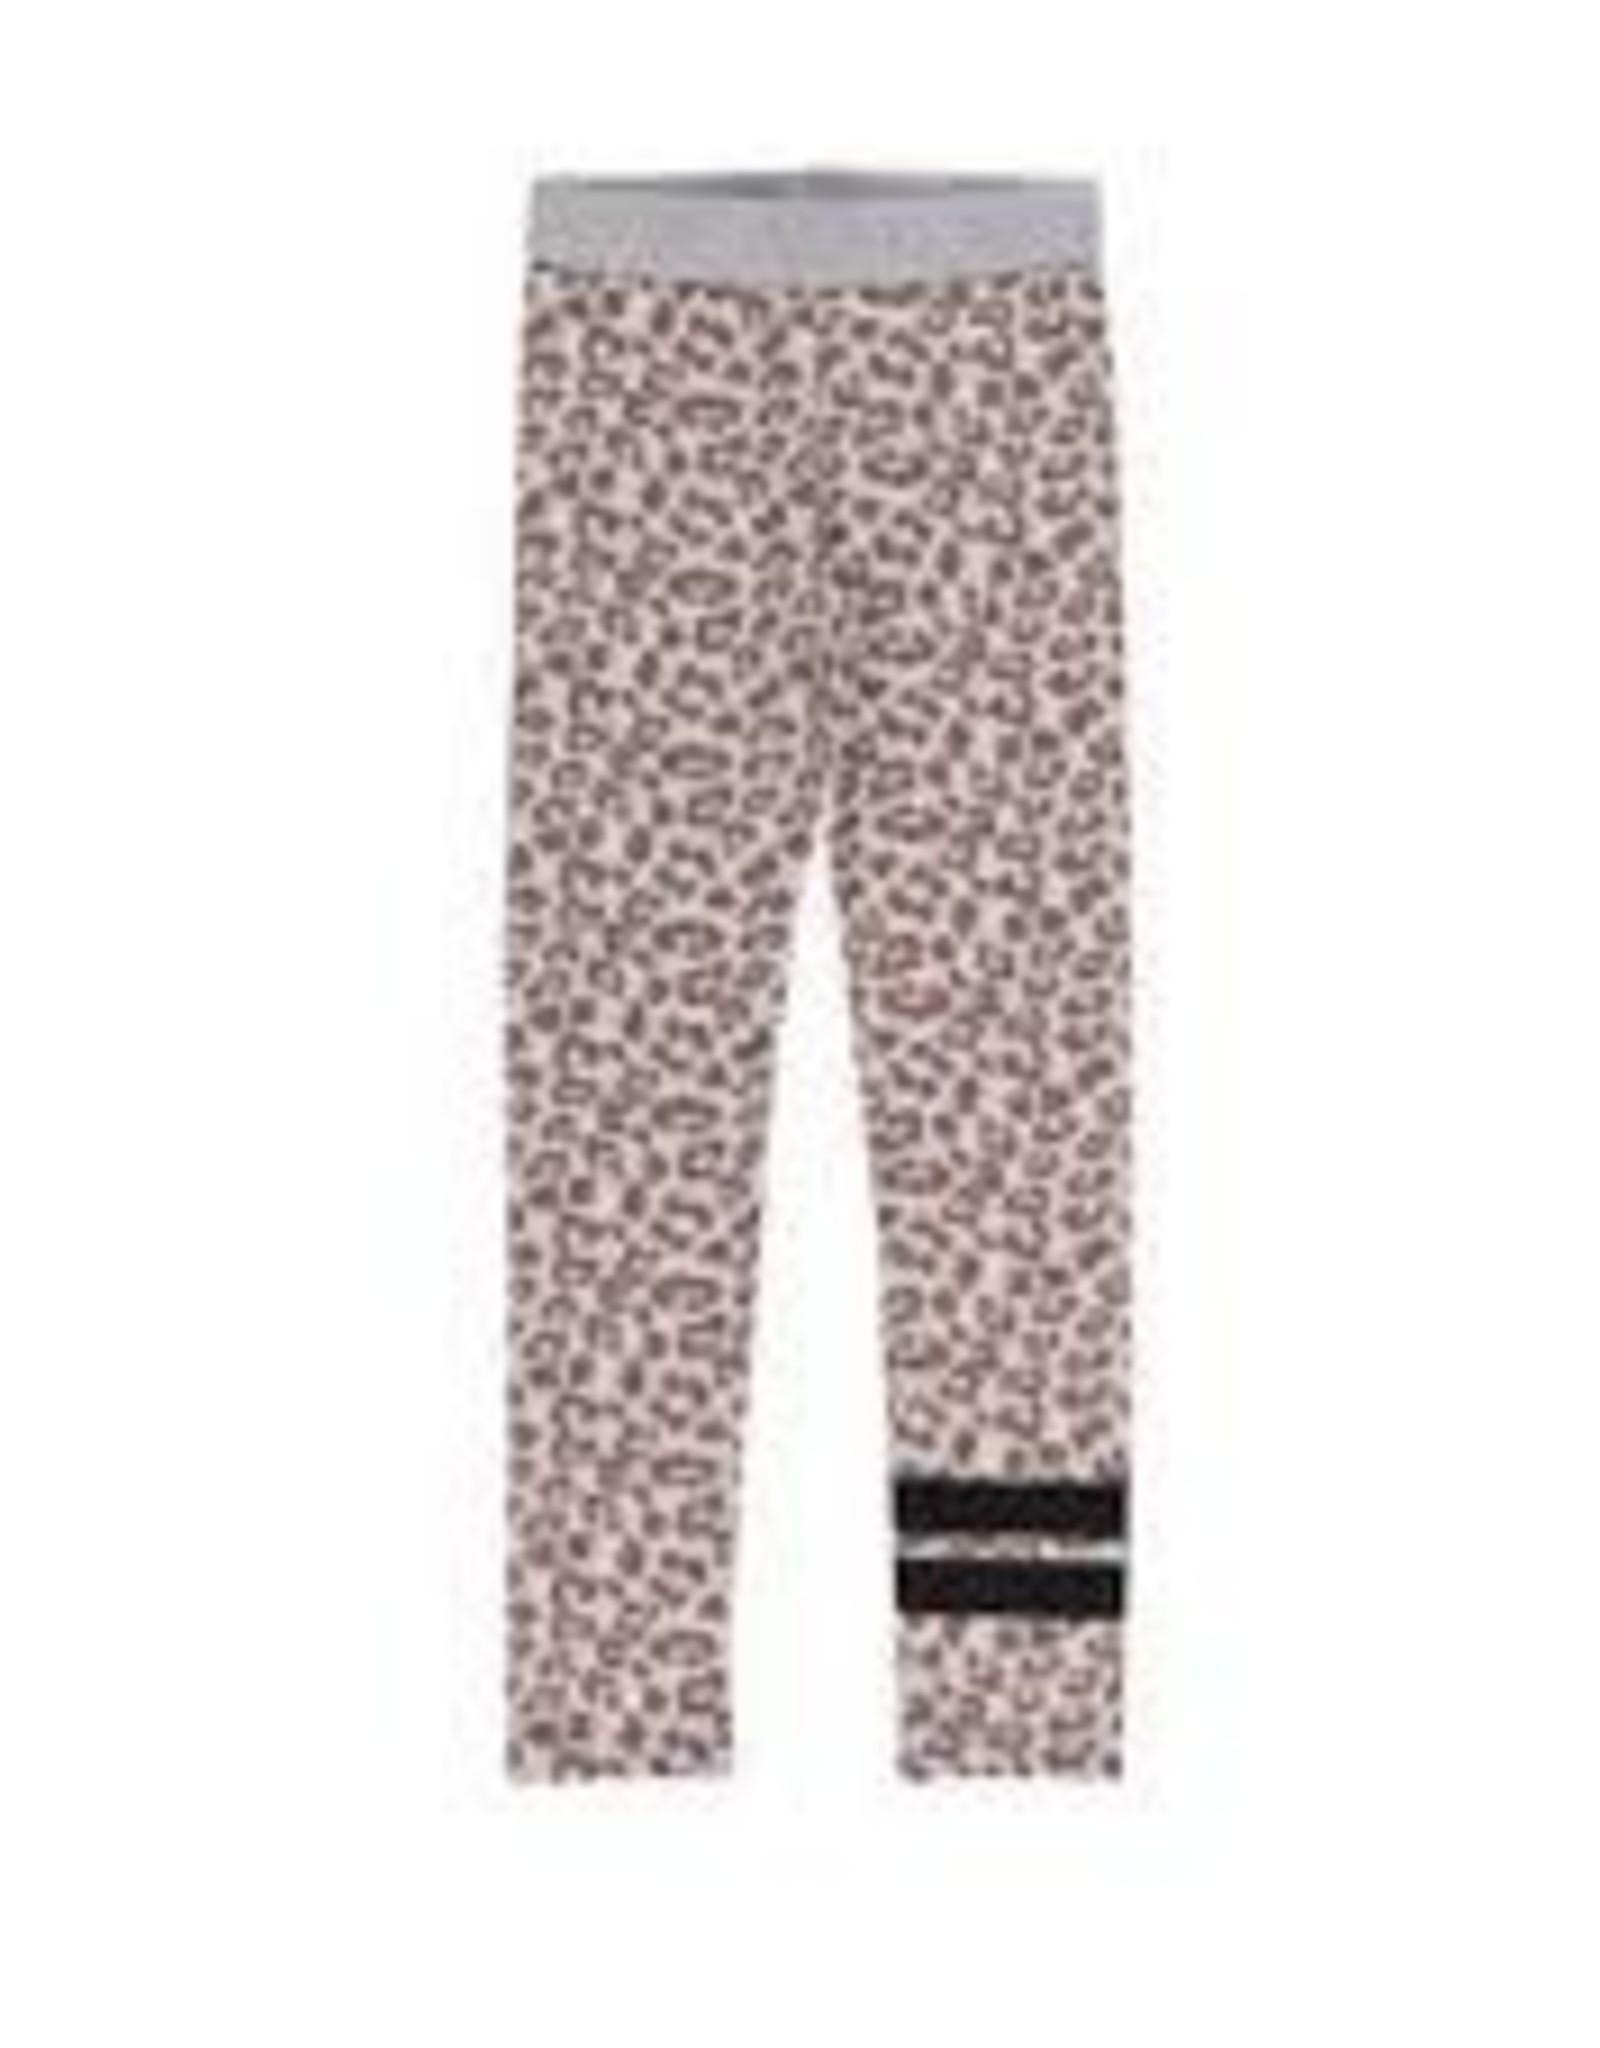 Little 10 Days Leggings Leopard